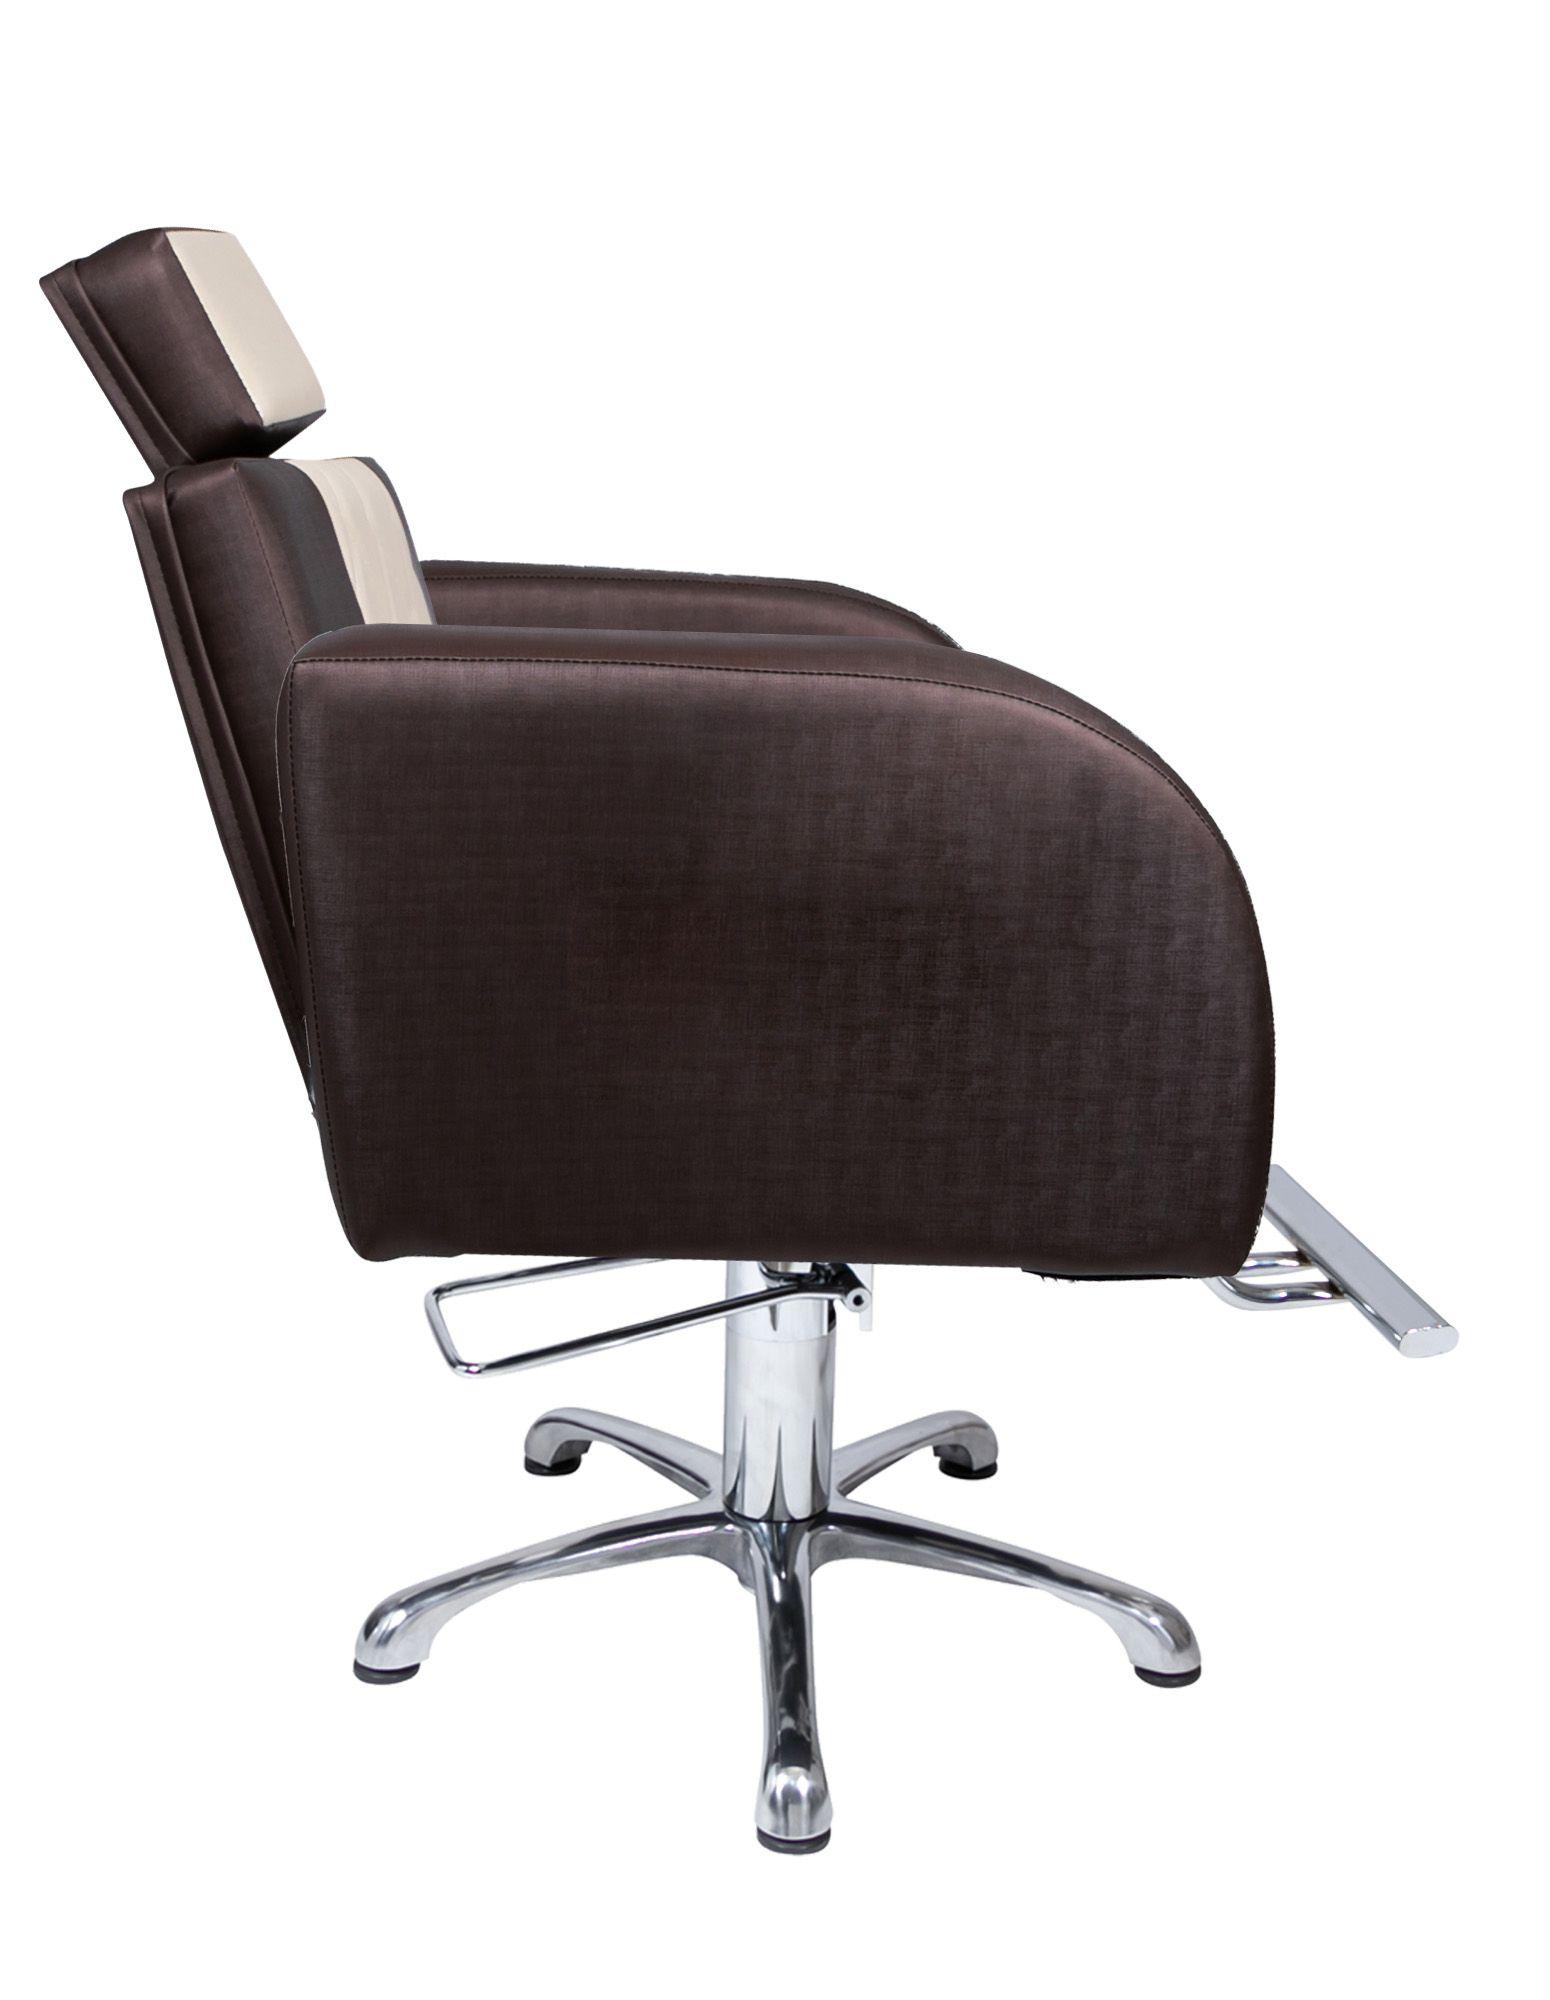 Poltrona Cadeira Hidráulica Stilo Fixa Bege/Marron